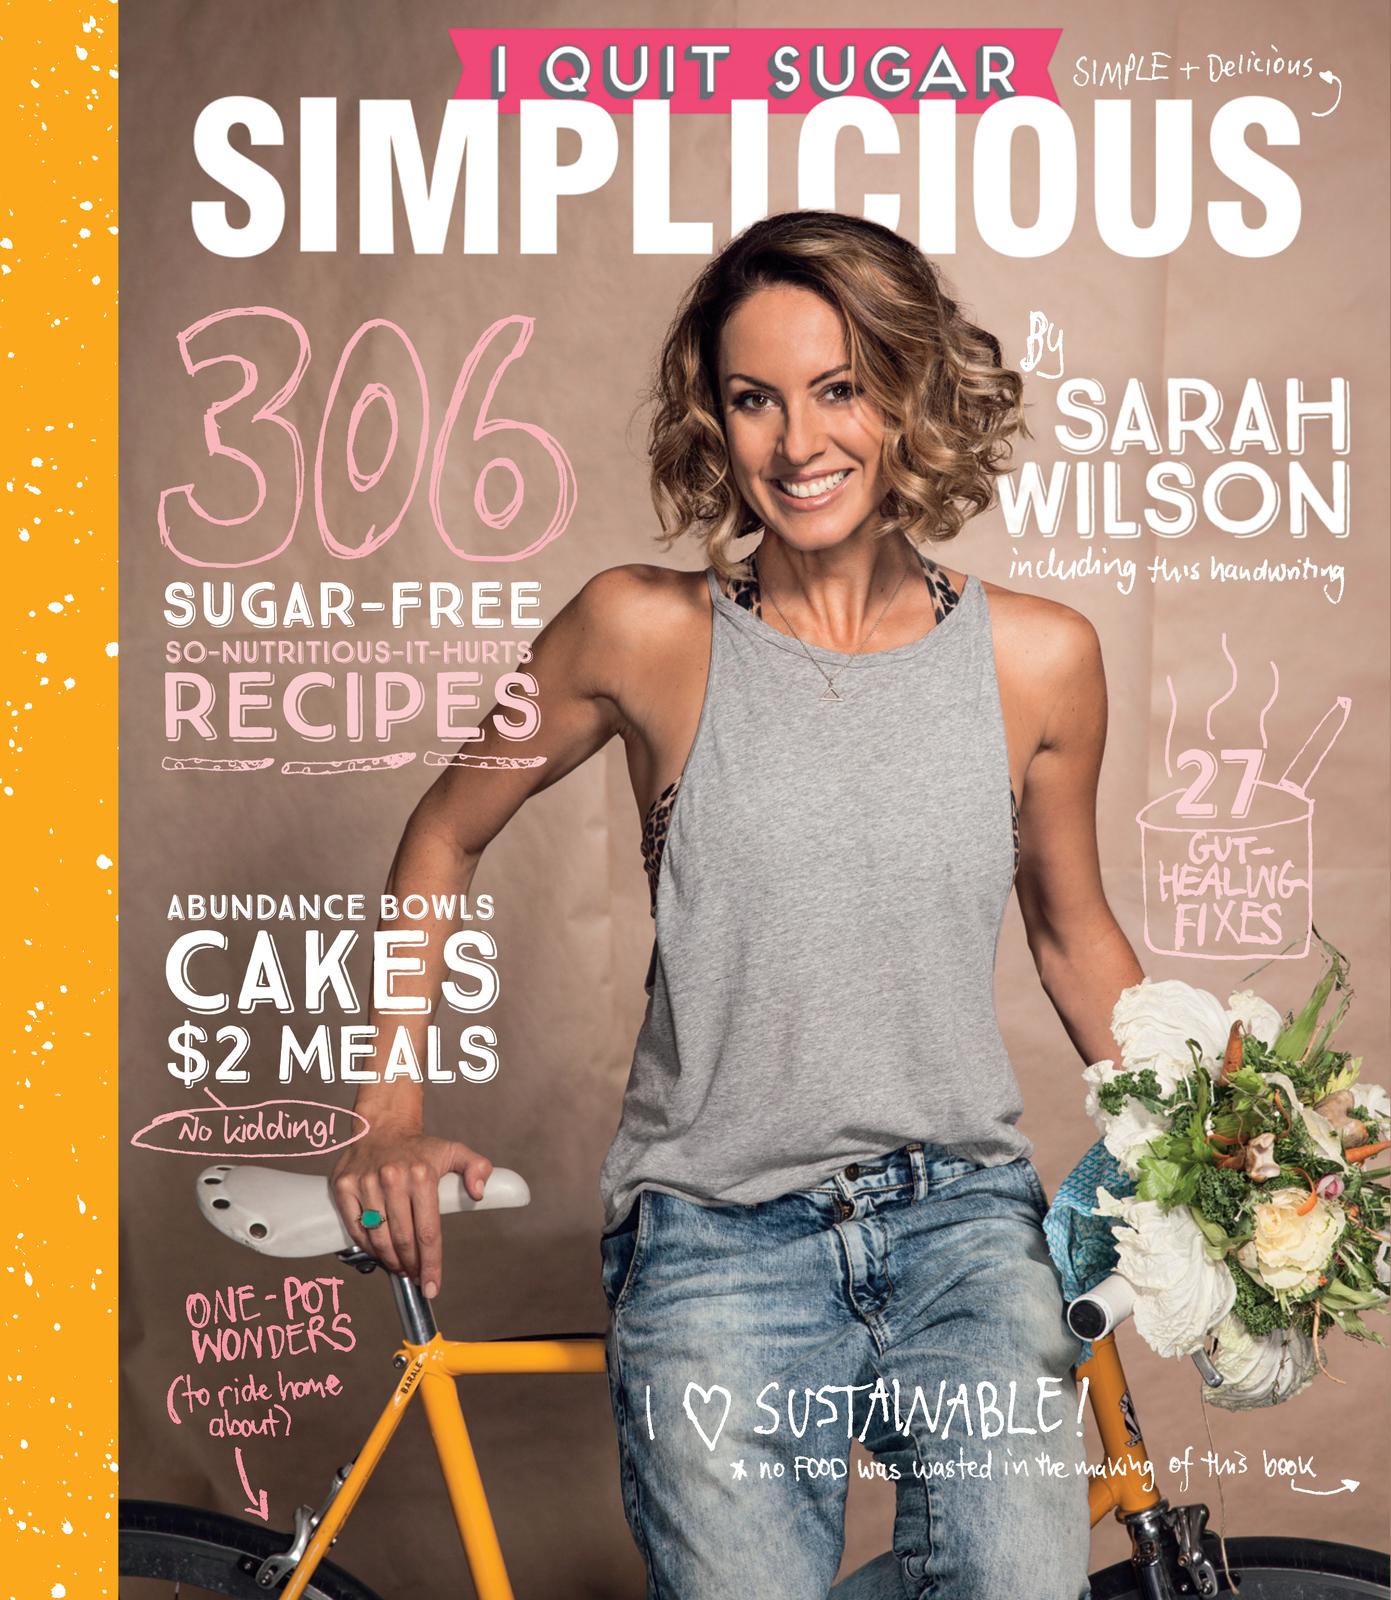 I Quit Sugar: Simplicious by Sarah Wilson image